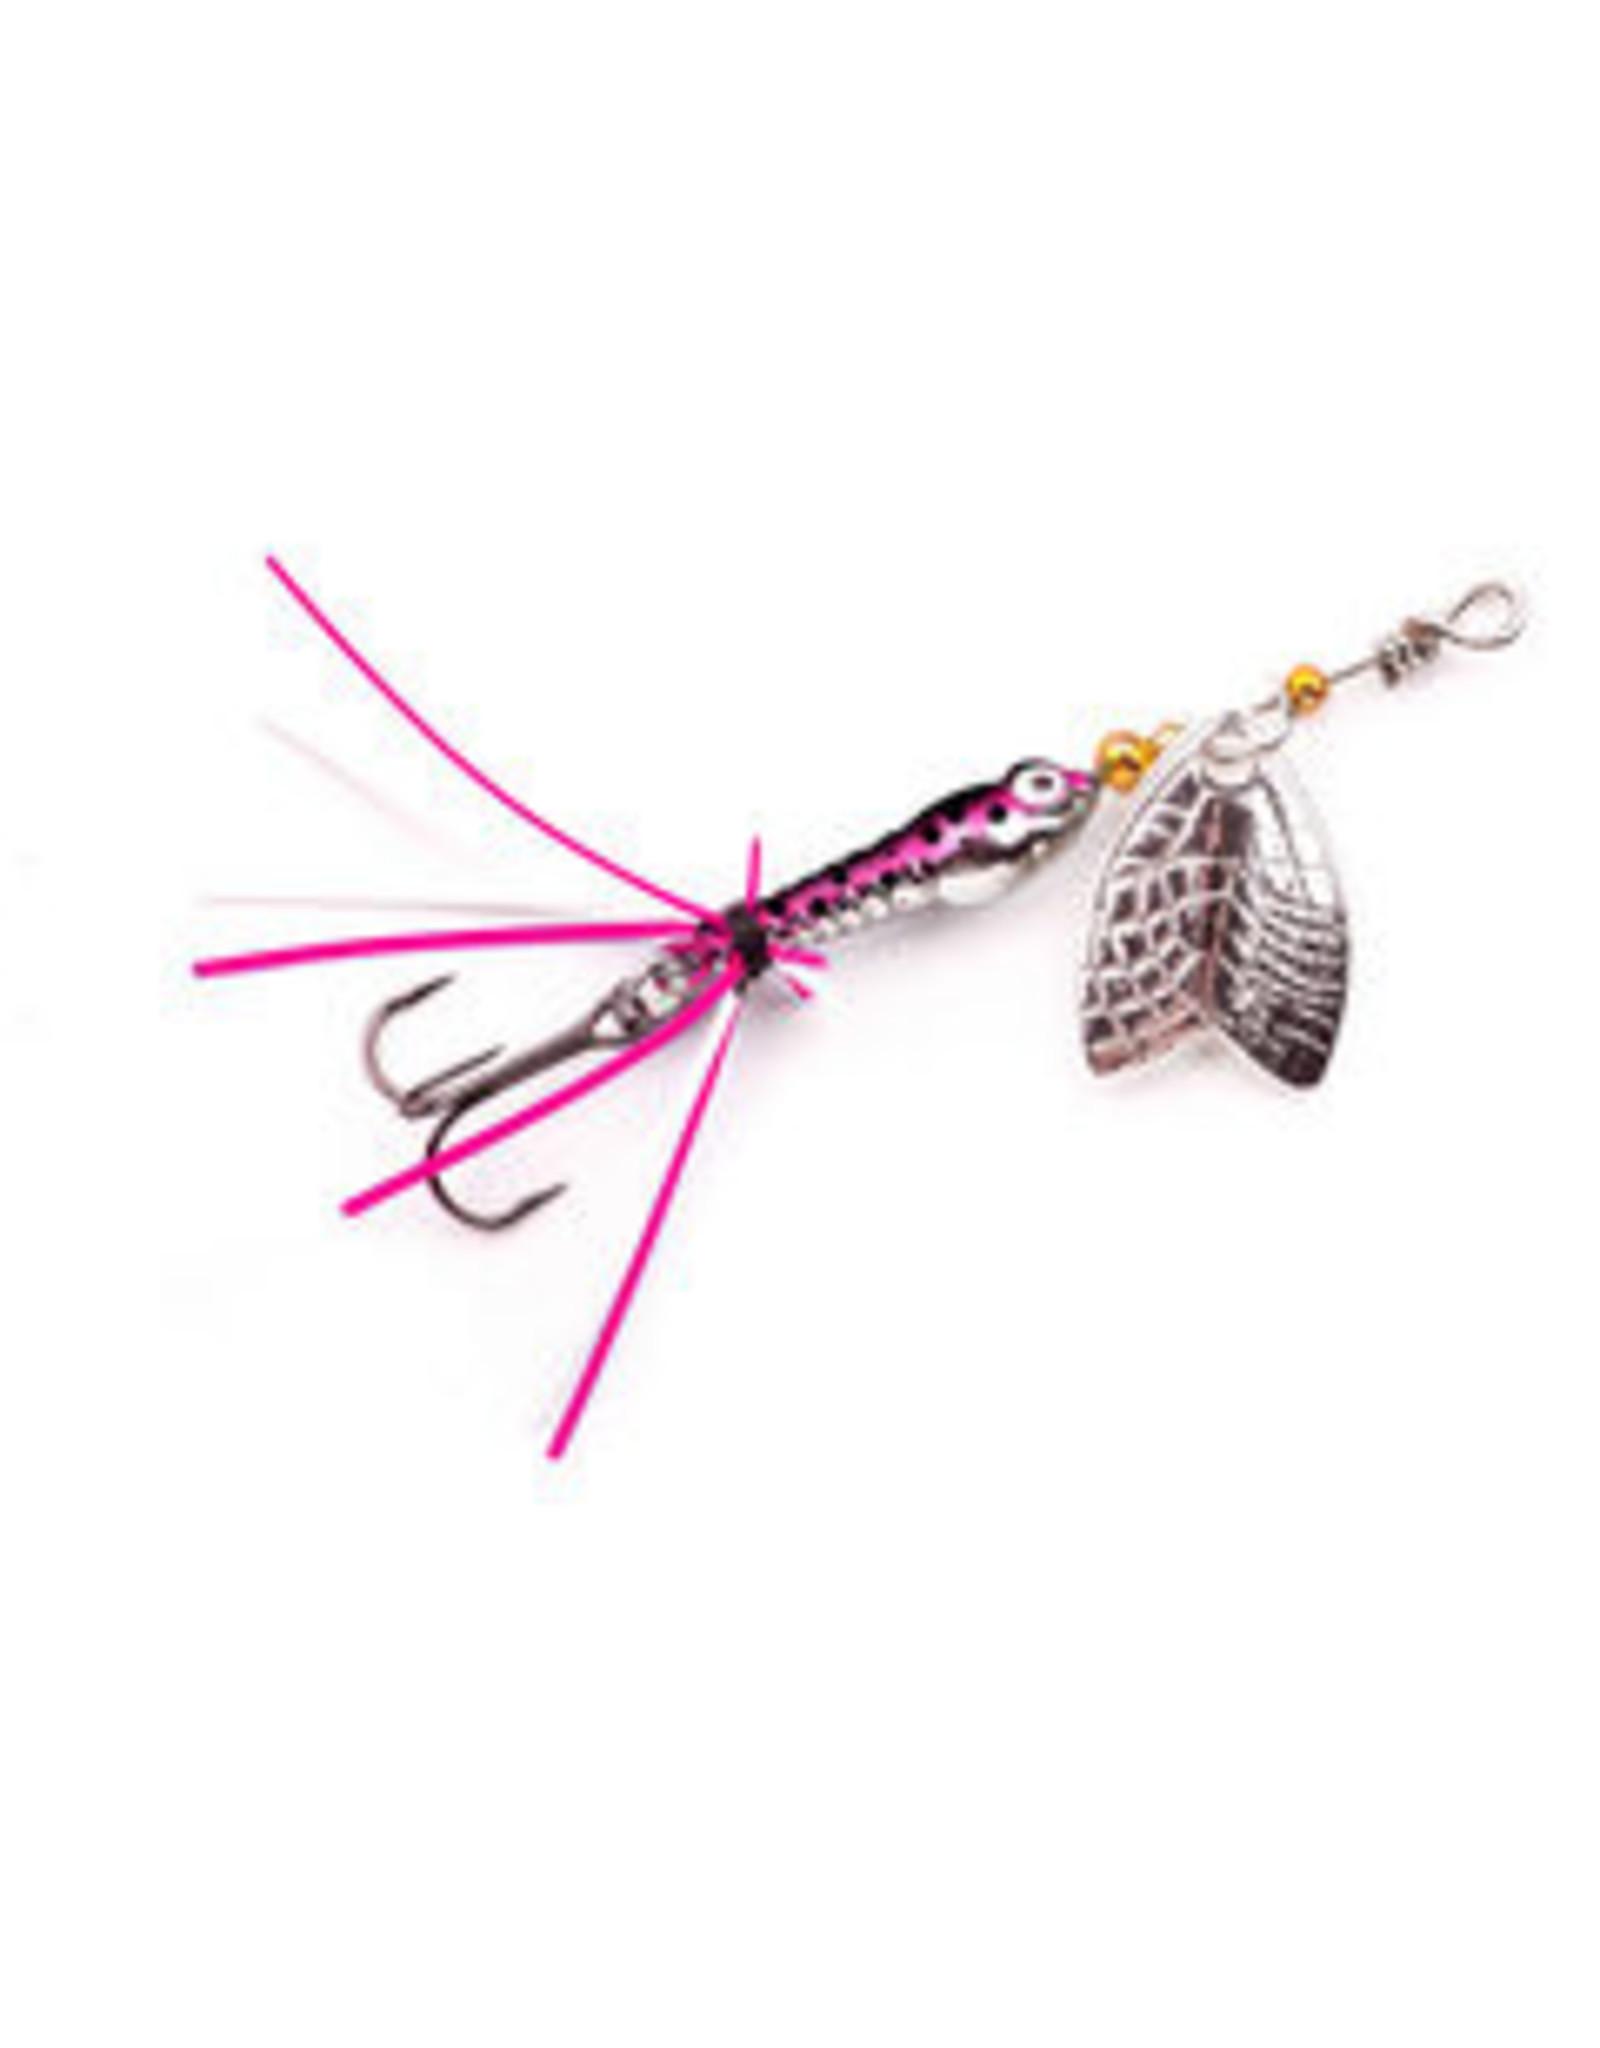 SPRO Larva Mayfly Micro Spinner Treble #10